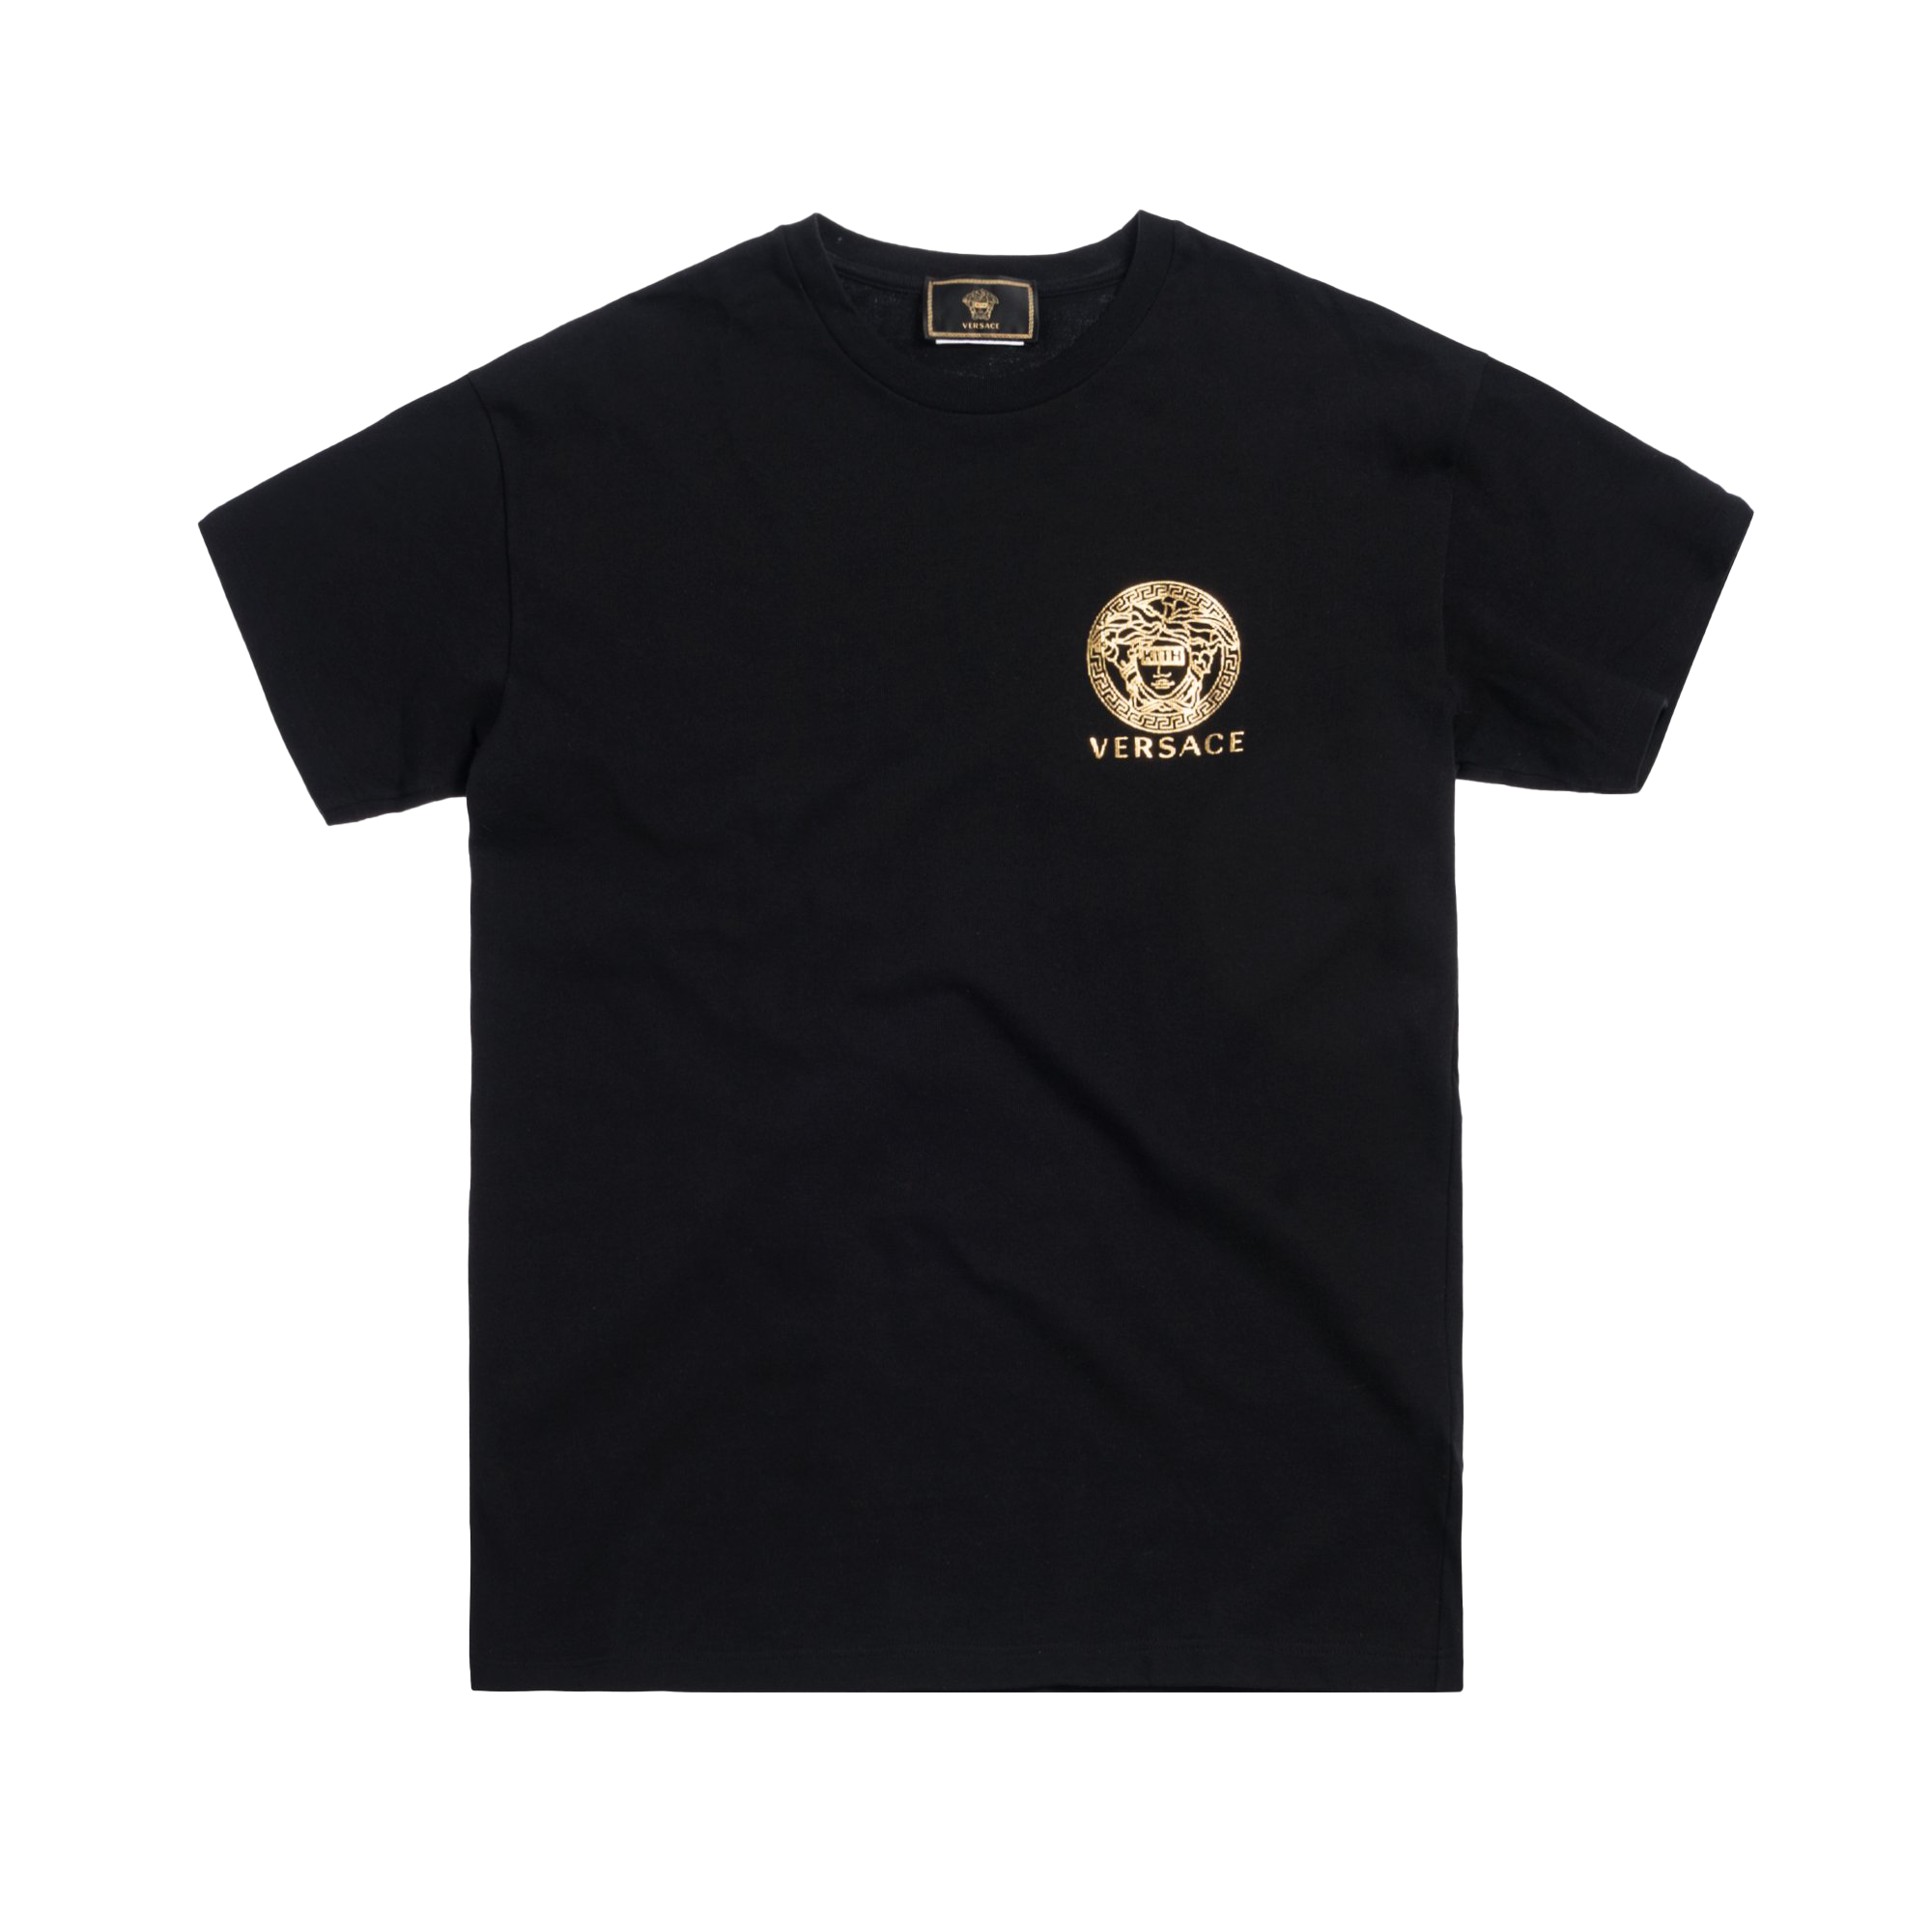 Kith x Versace Mini Medusa Tee Black/Gold